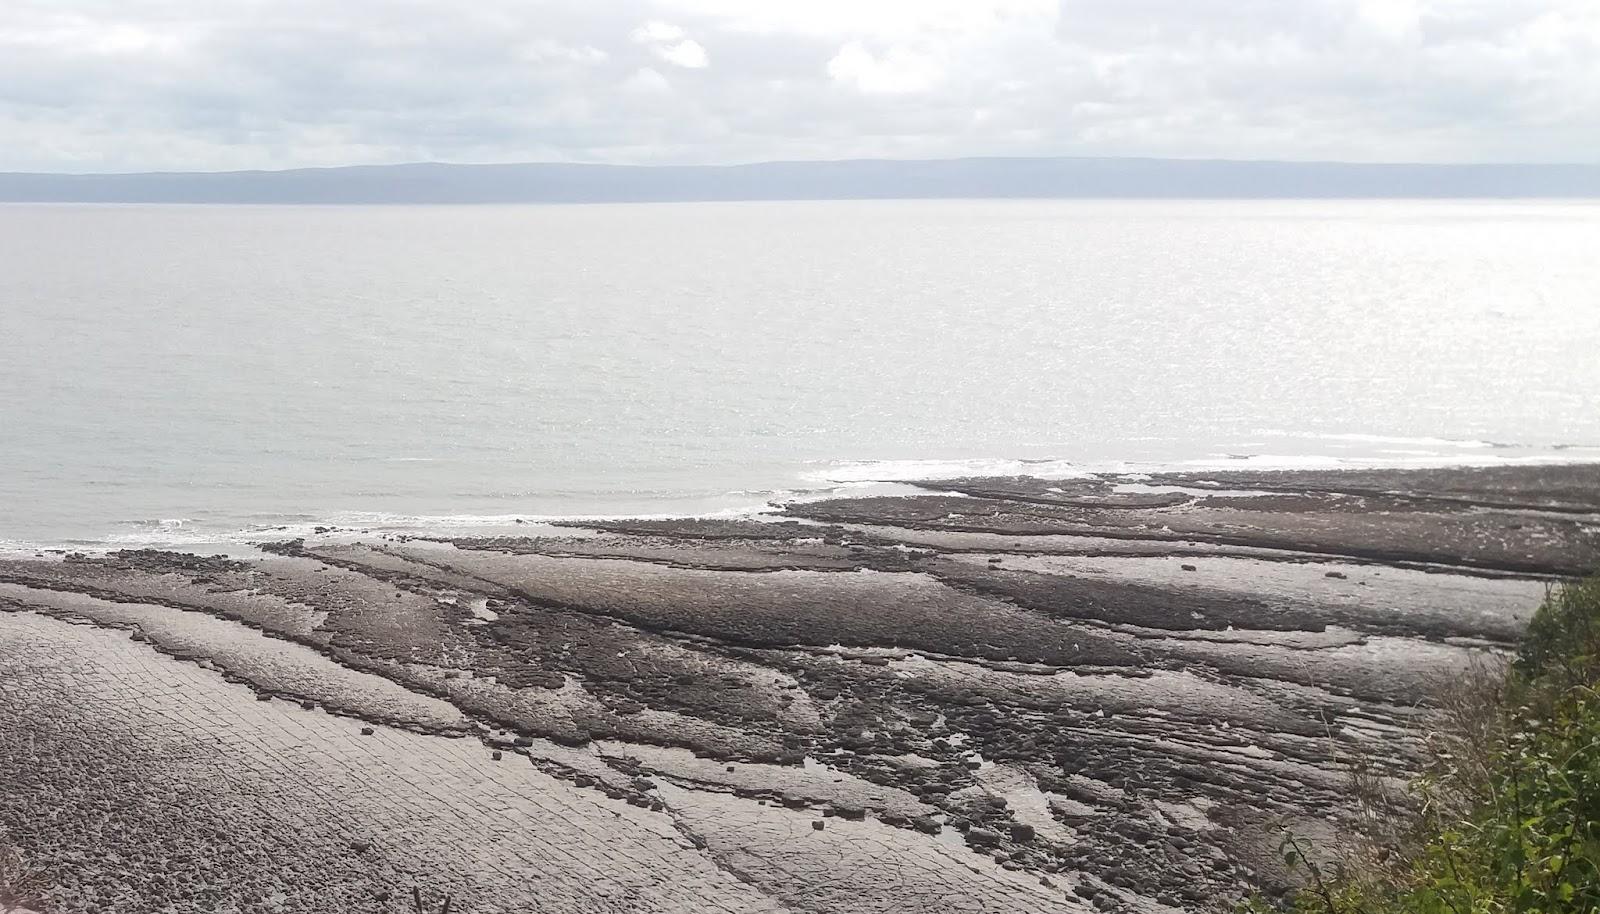 20170824 145539 Rock patterns on St Donat's bay beach